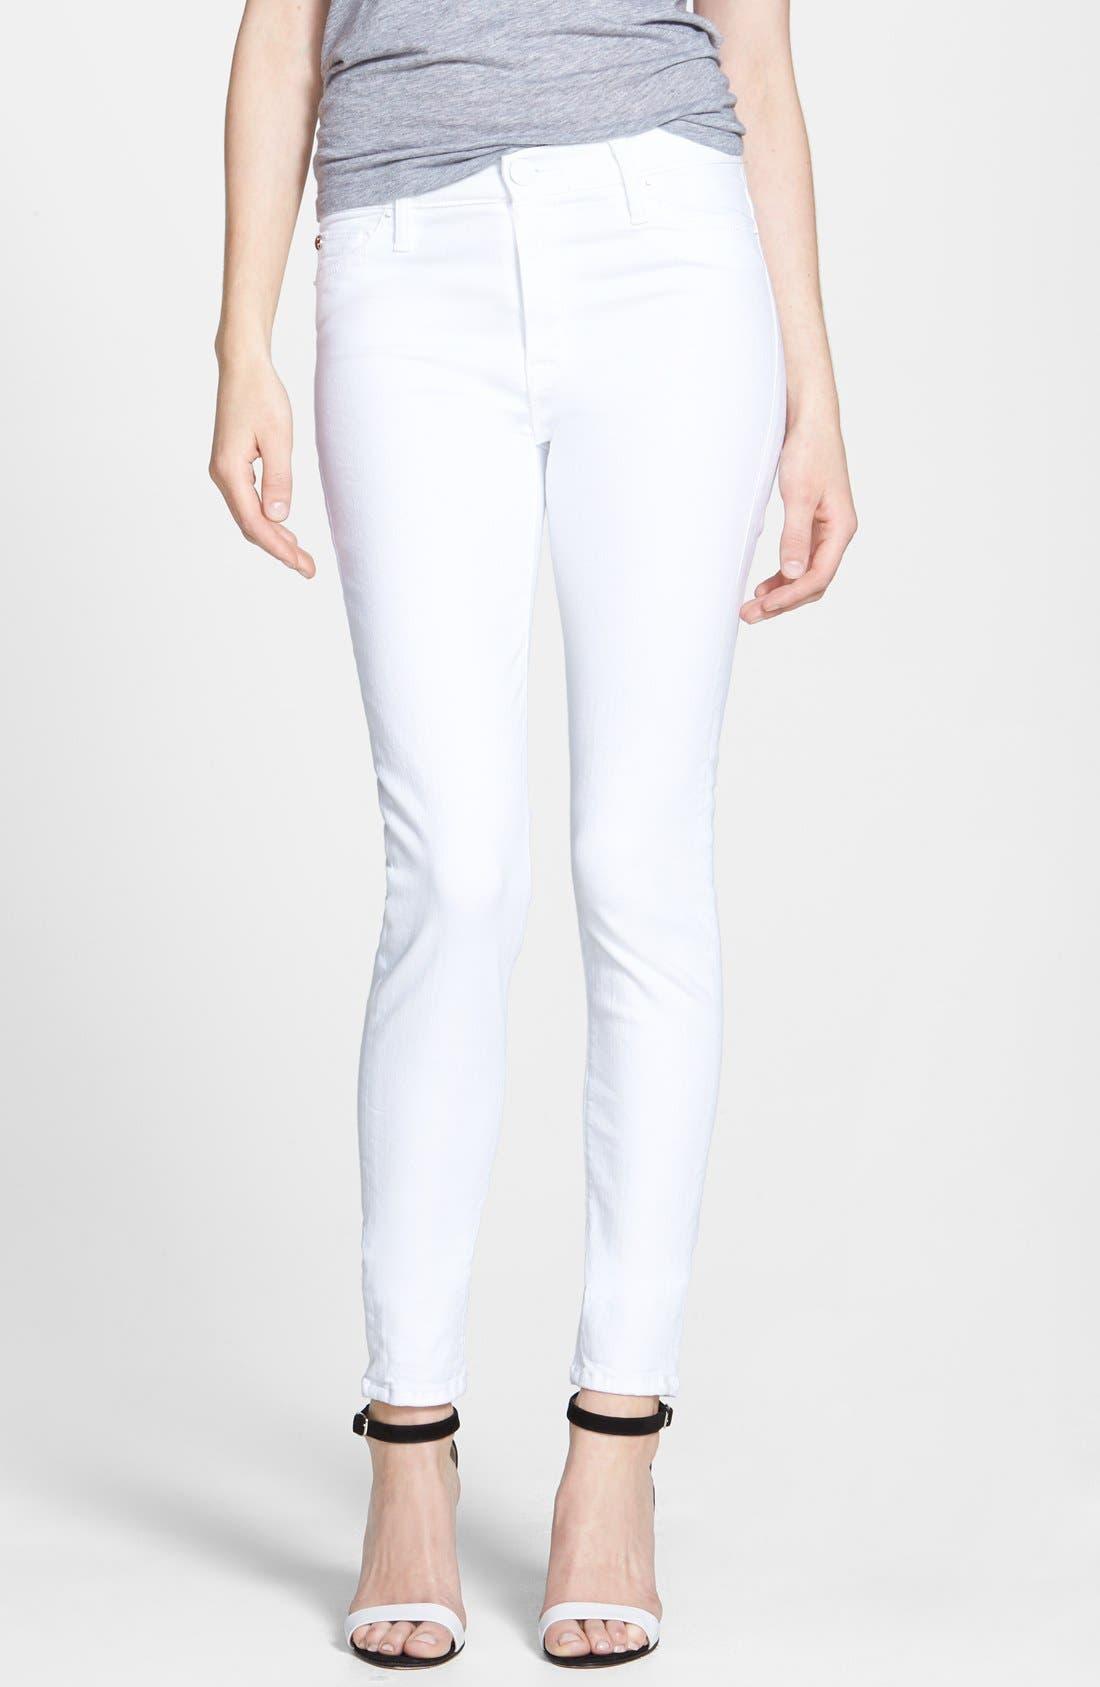 Alternate Image 1 Selected - Hudson Jeans 'Nico' Skinny Stretch Jeans (White)